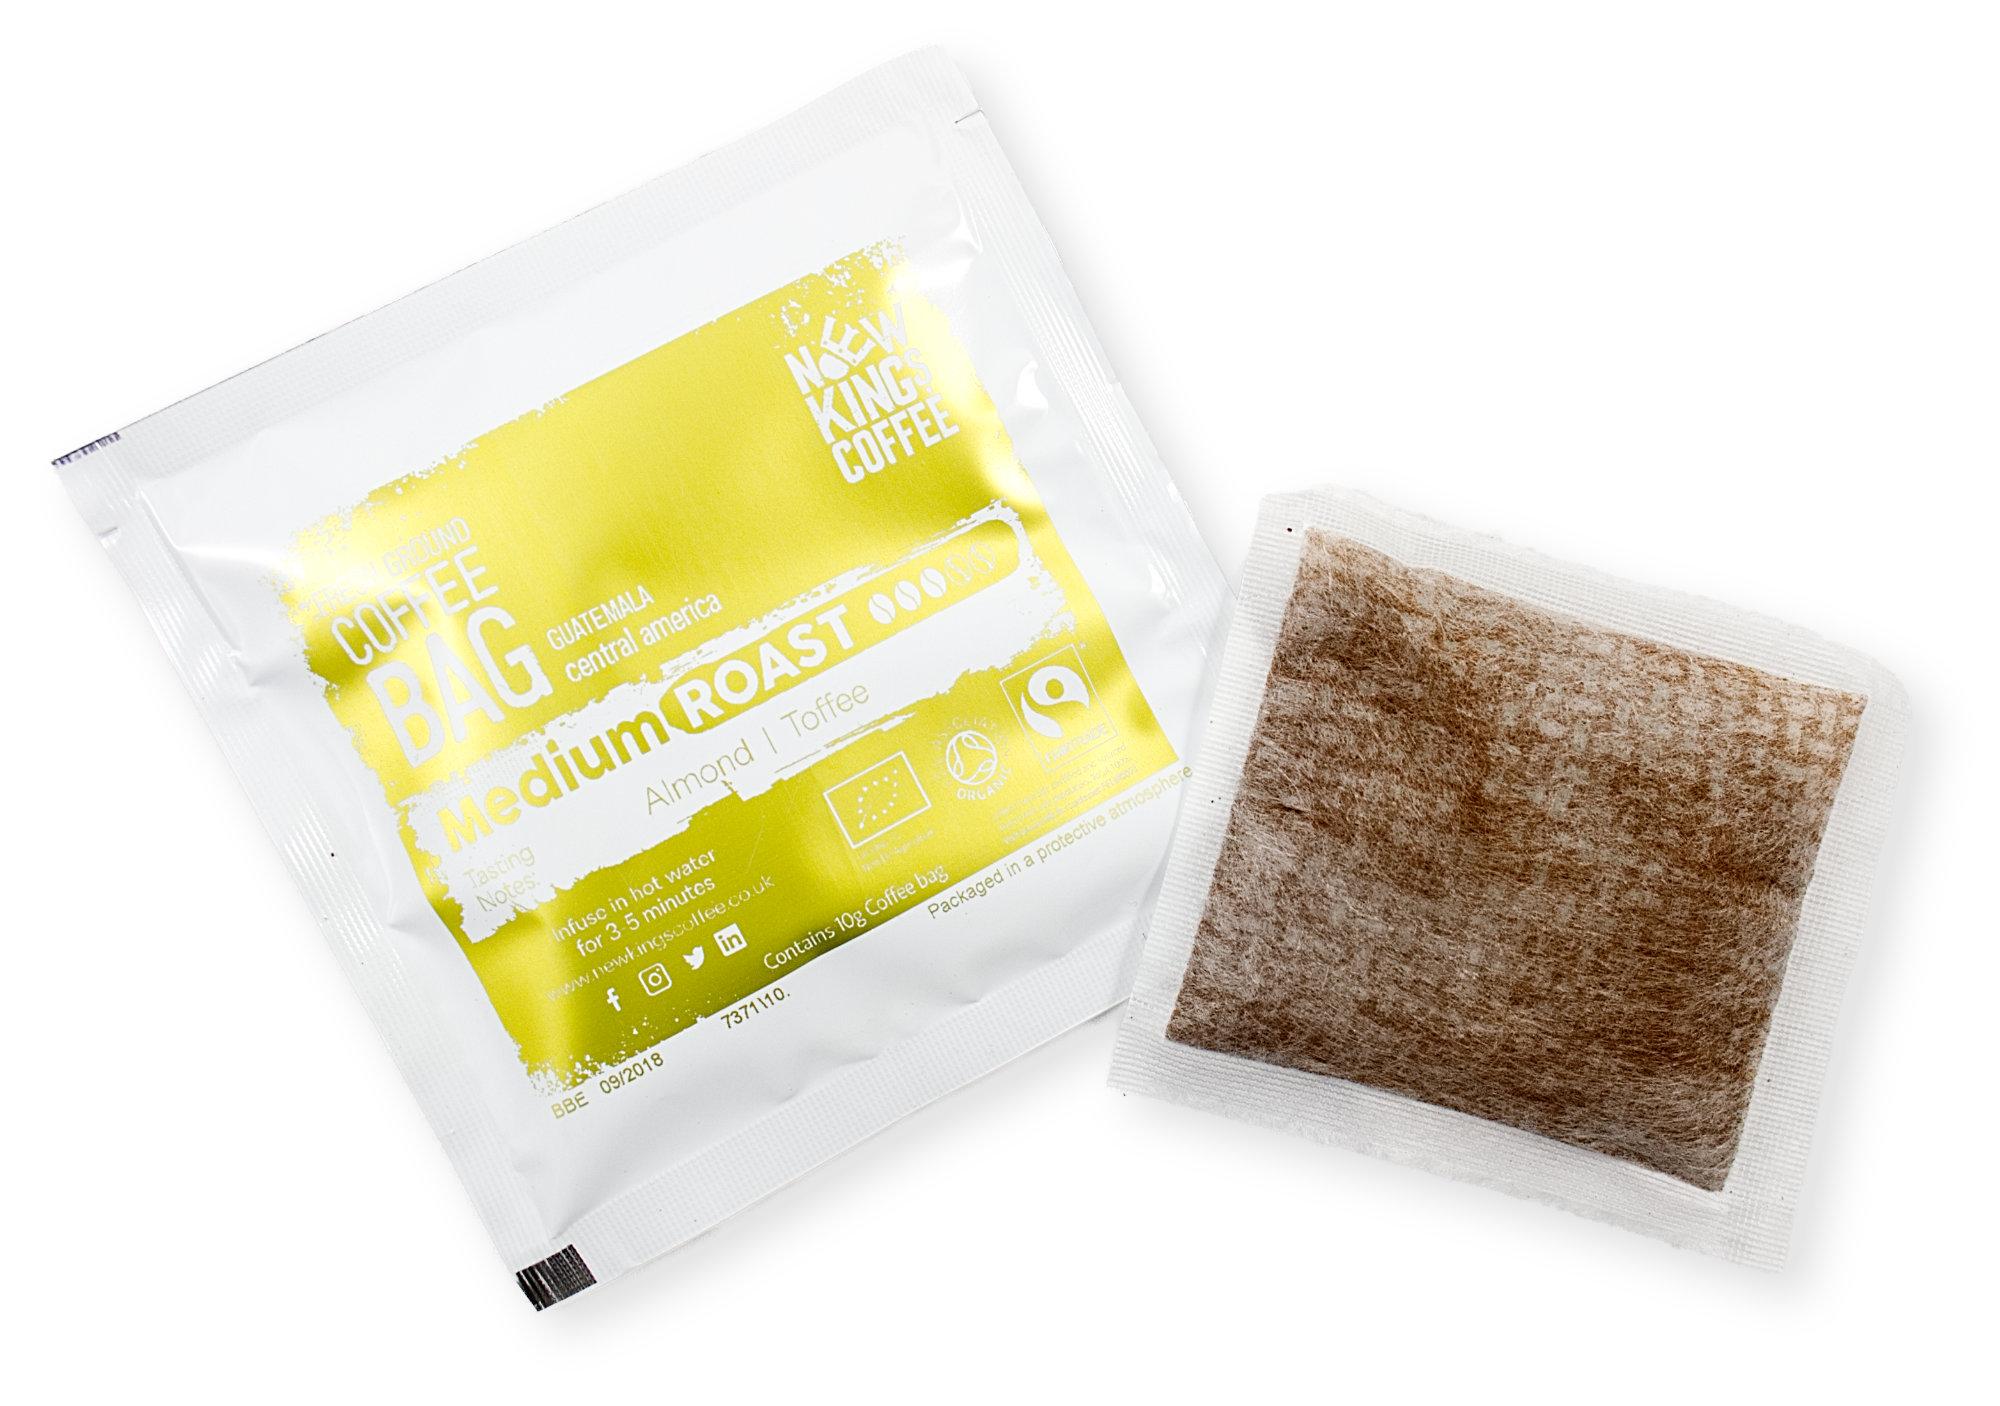 New-Kings-Coffee-Bags-Fairtrade-Organic-Guatemala-foil-and-bag.jpg